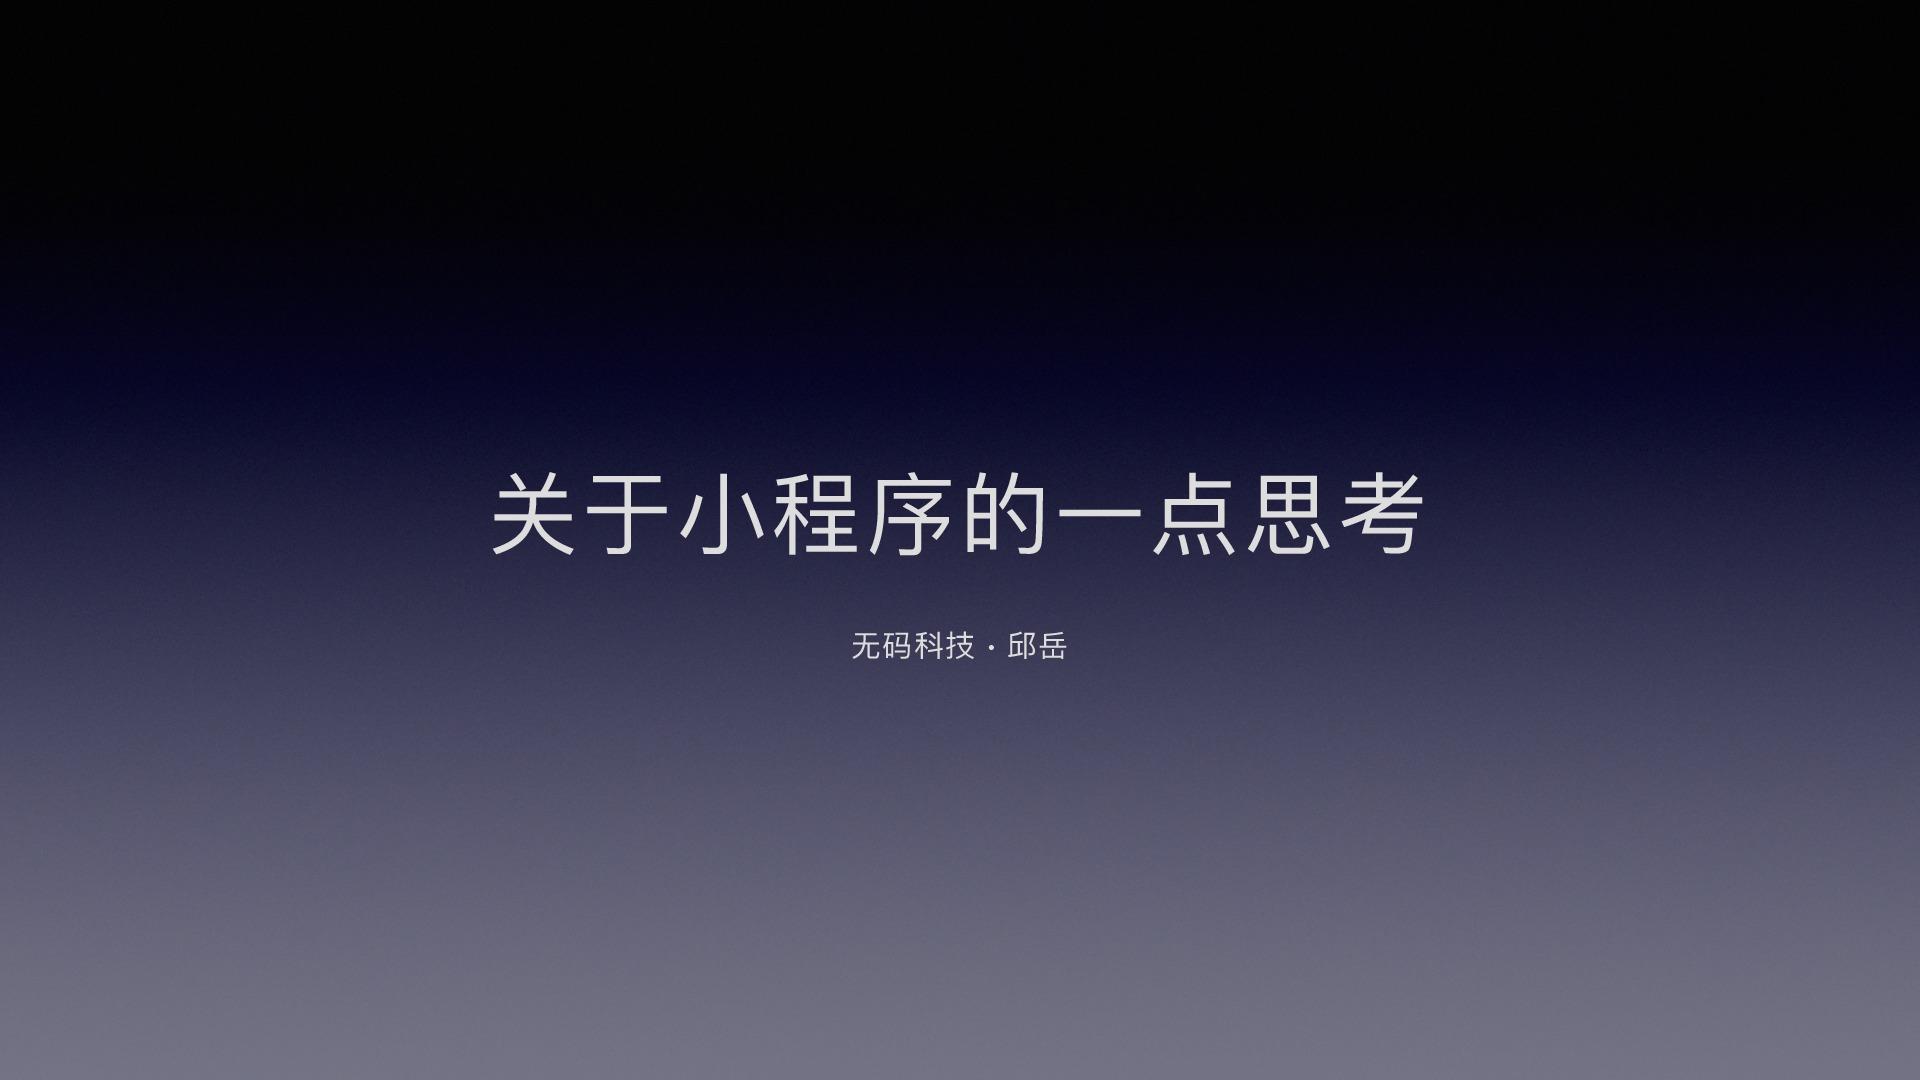 https://opentalk-blog.b0.upaiyun.com/prod/2018-12-18/b73ca3460a1fdfb1829769f93fa6f74d